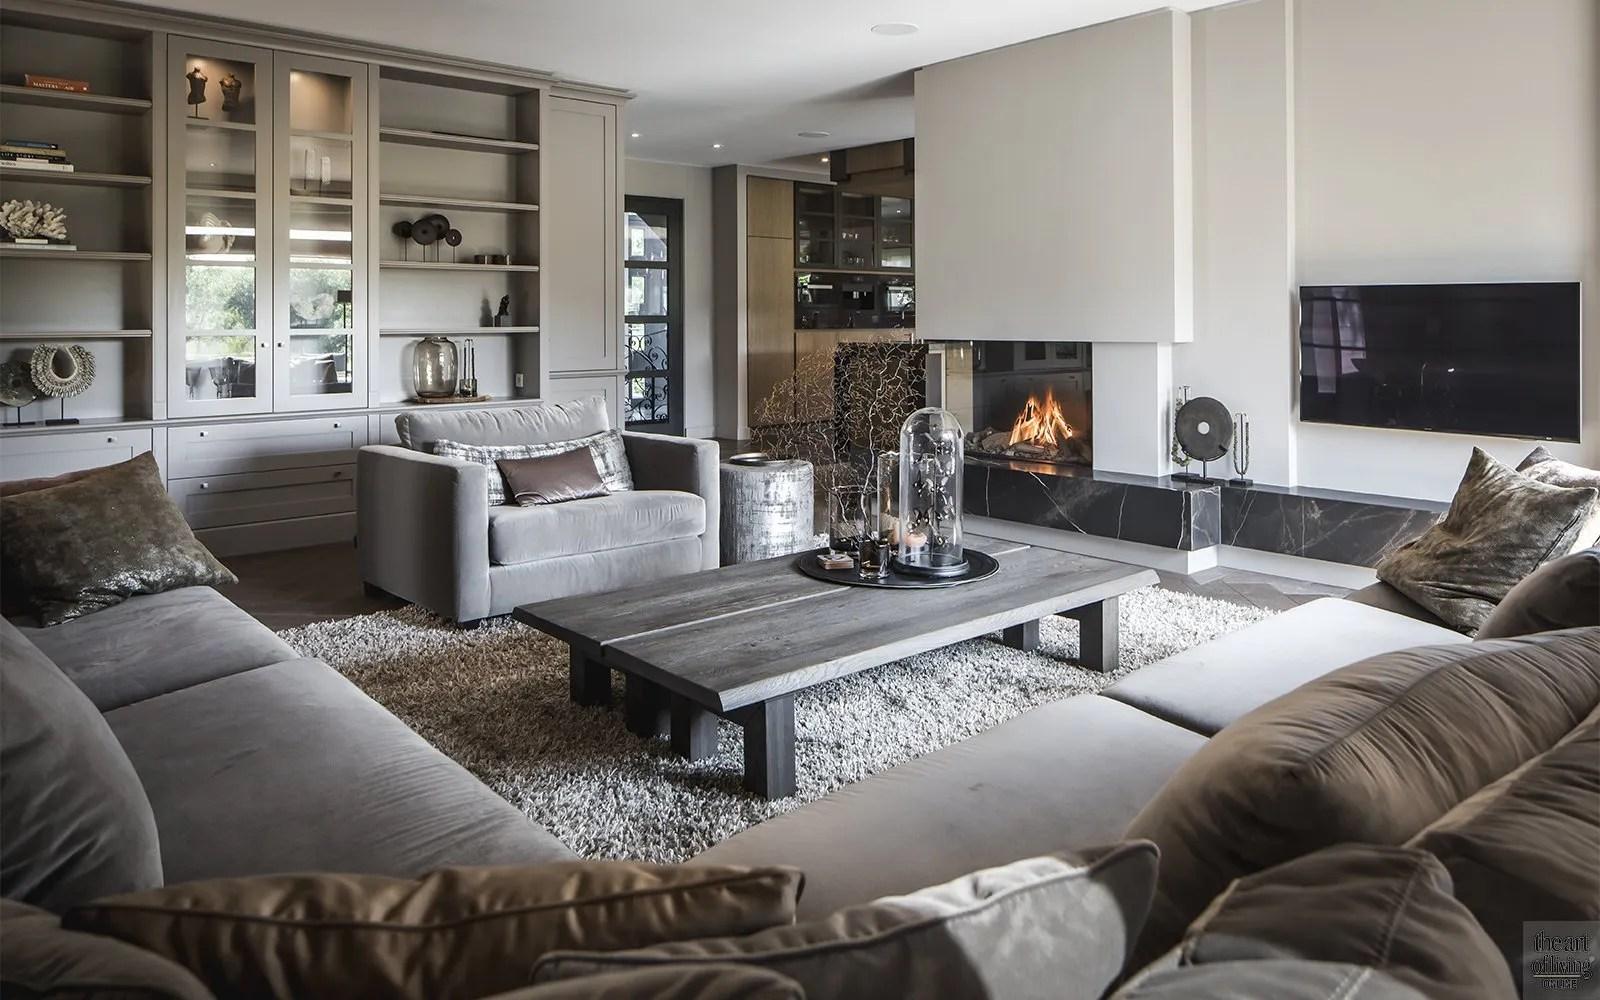 Moderne Villa Met Luxe Interieur Versteegh Design The Art Of Living Nl